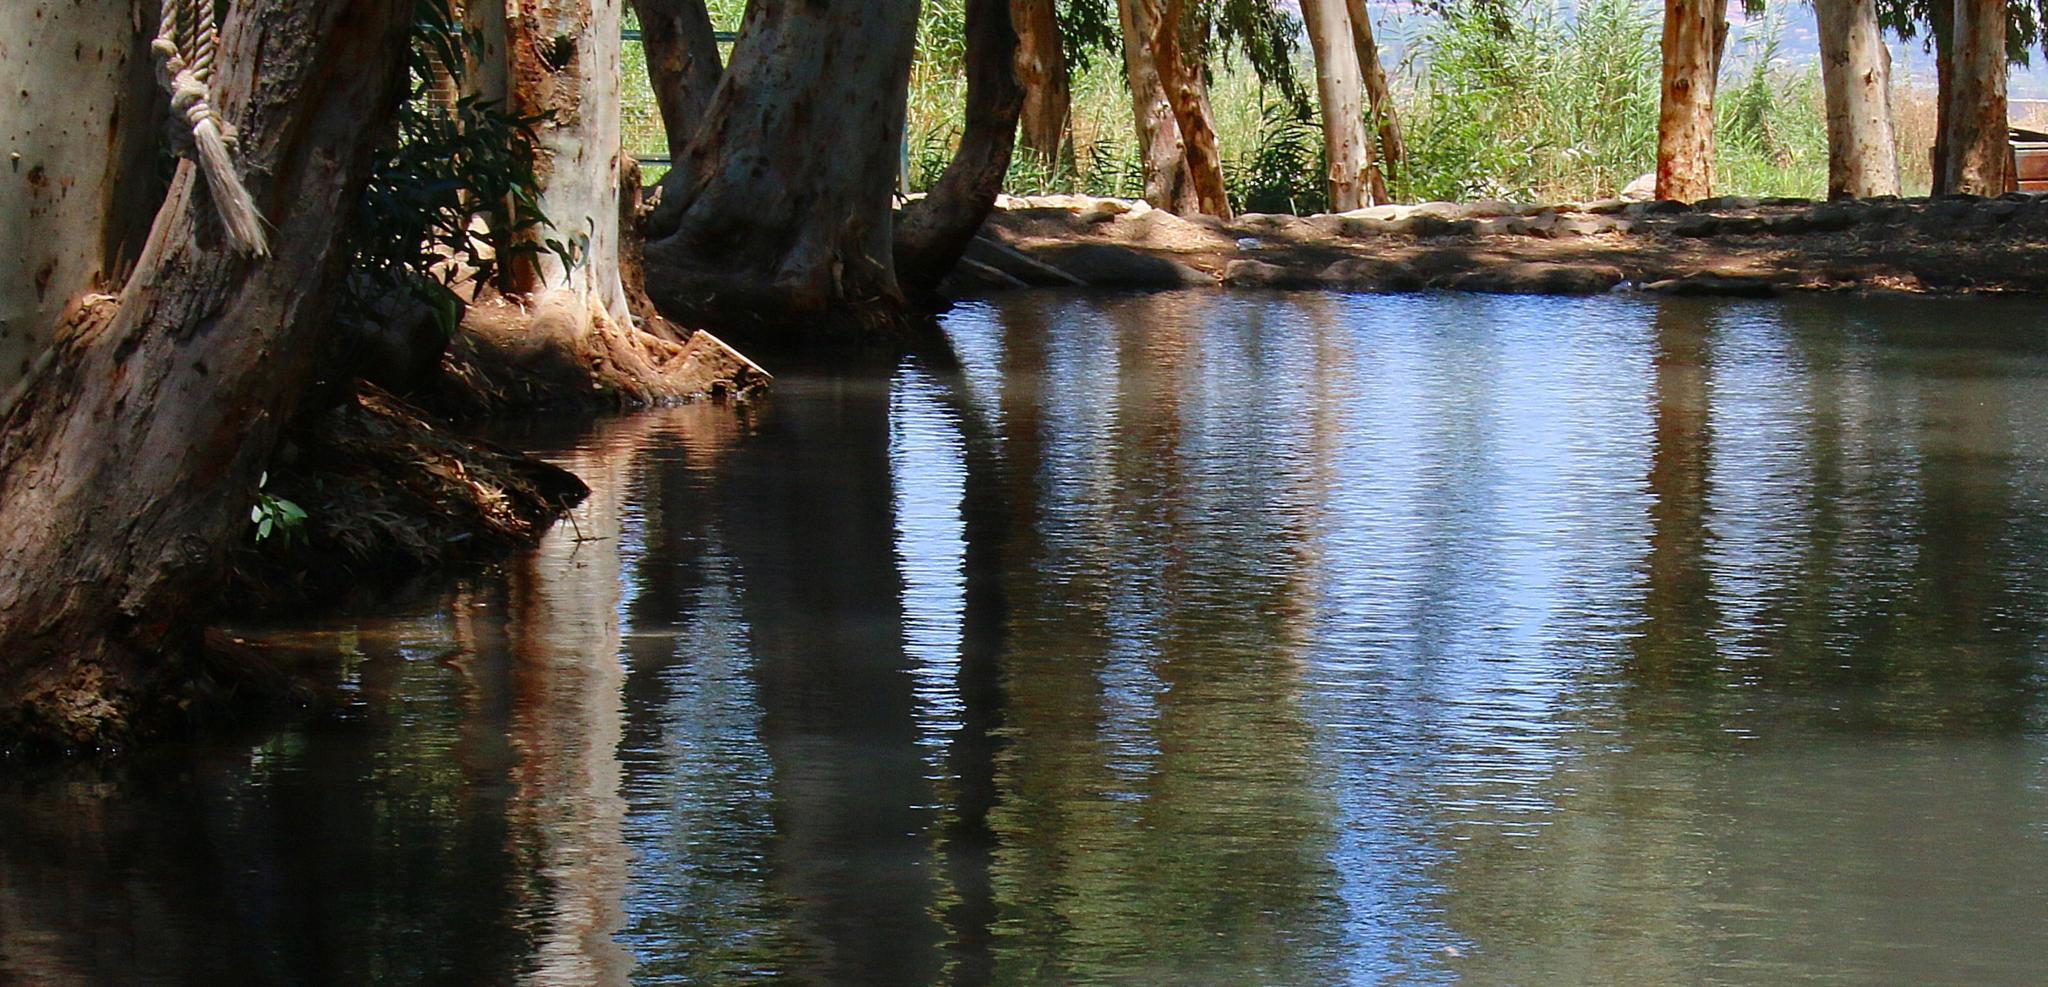 Reflection Spring water by ITZIK YOTVAT